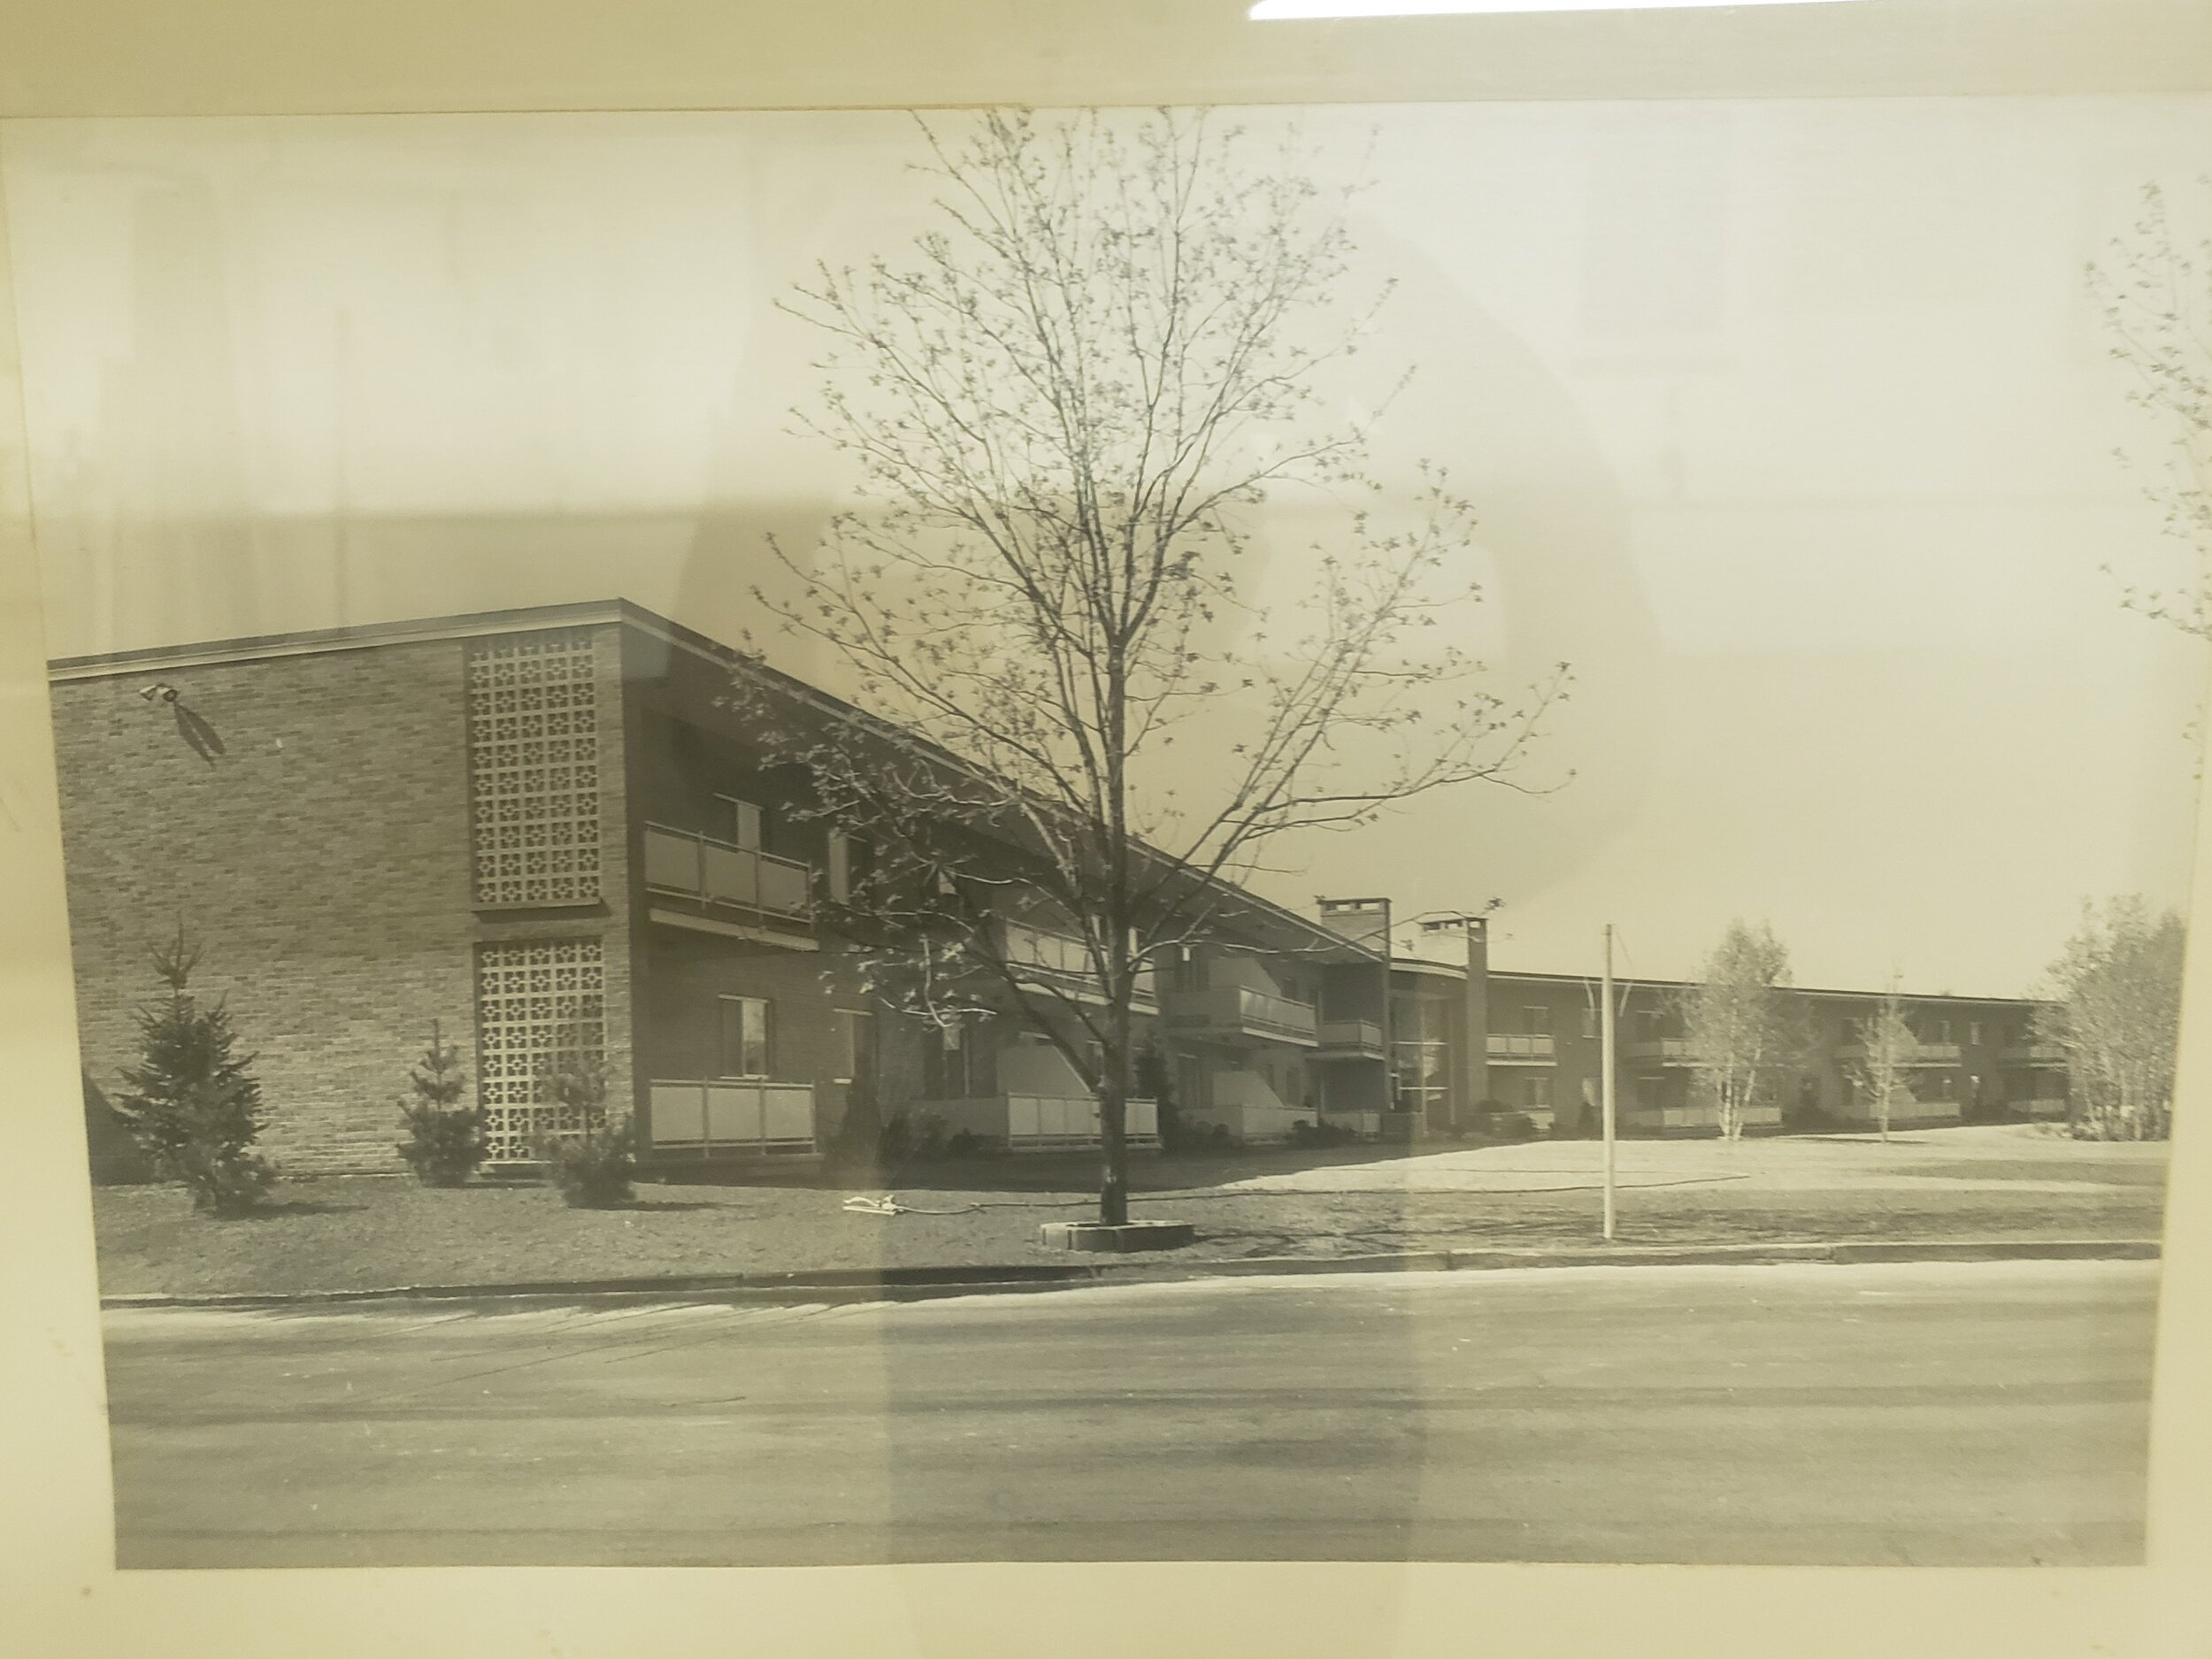 Royal Ridge LuxuryApartment Complex - Circa 1965